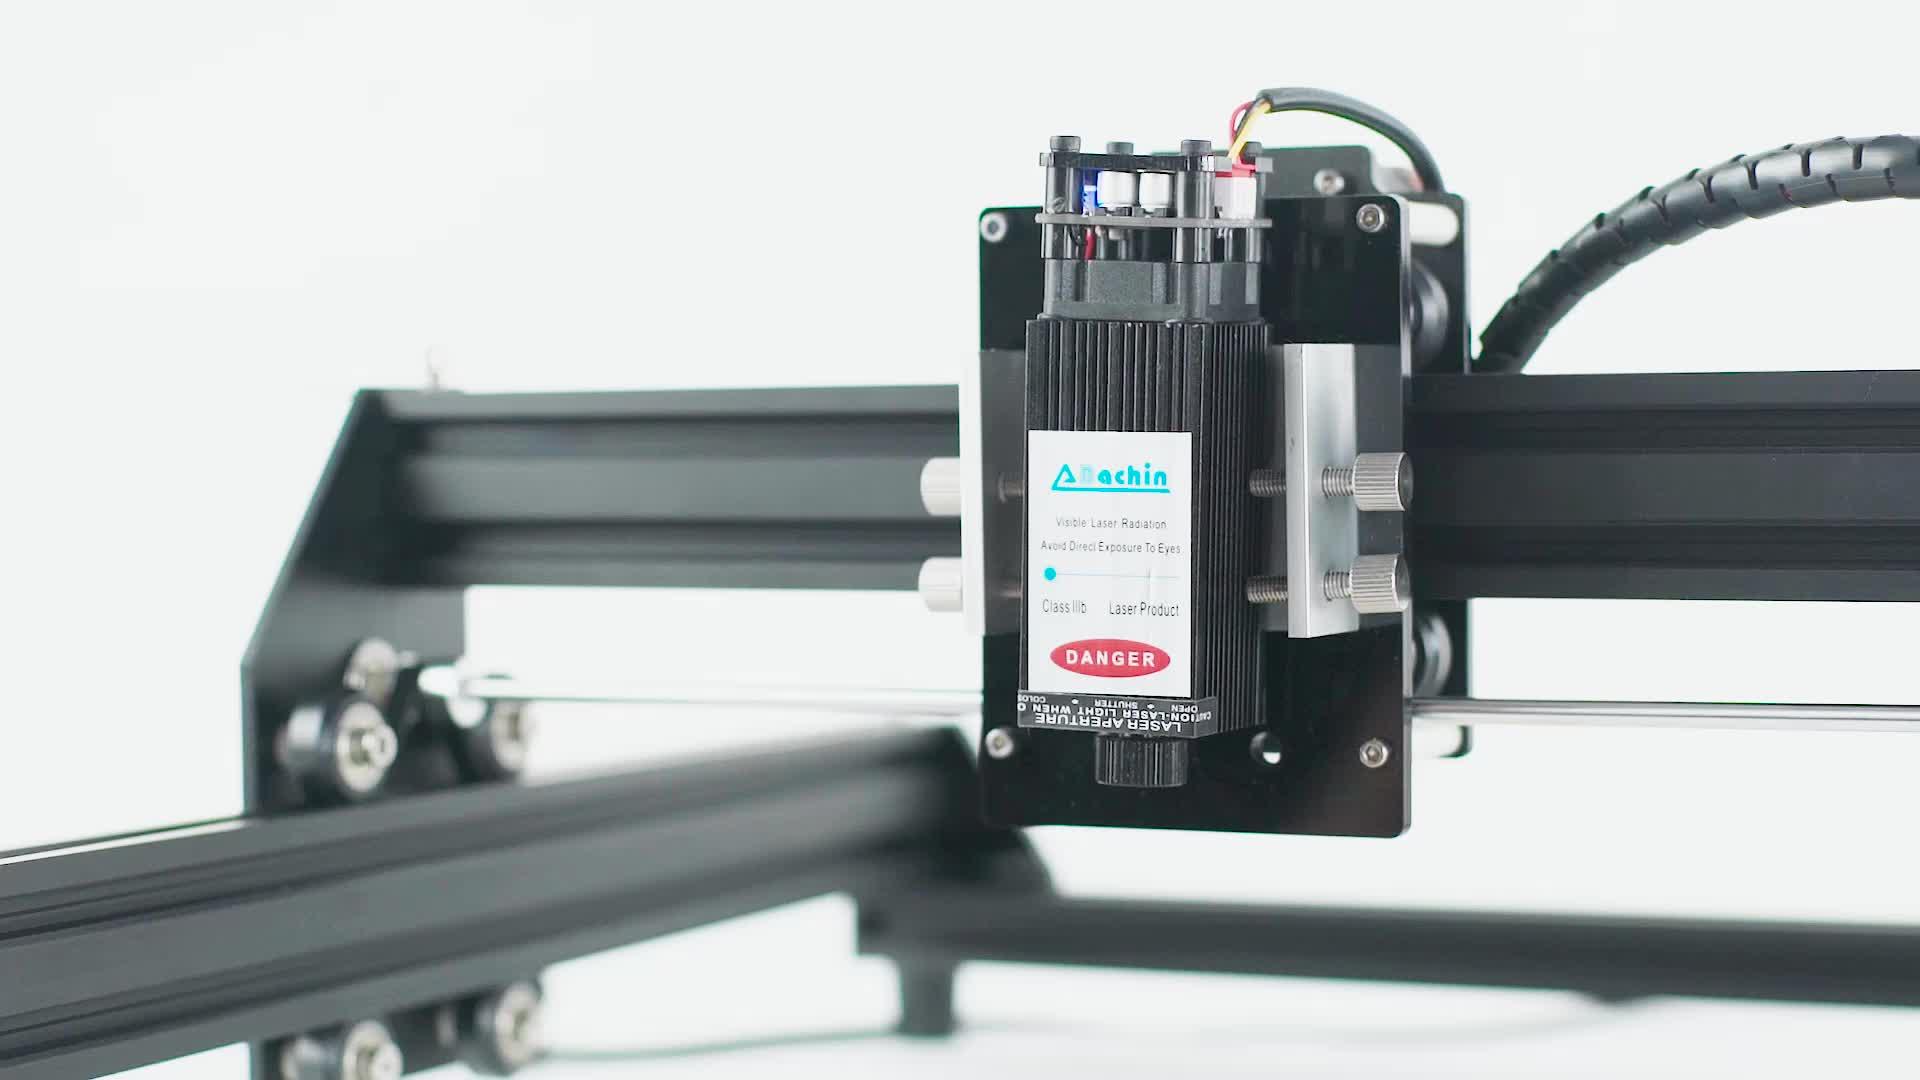 BACHIN good price 2500mW advanced toys wood leather mini laser engraving machine diy cnc cutting engraver